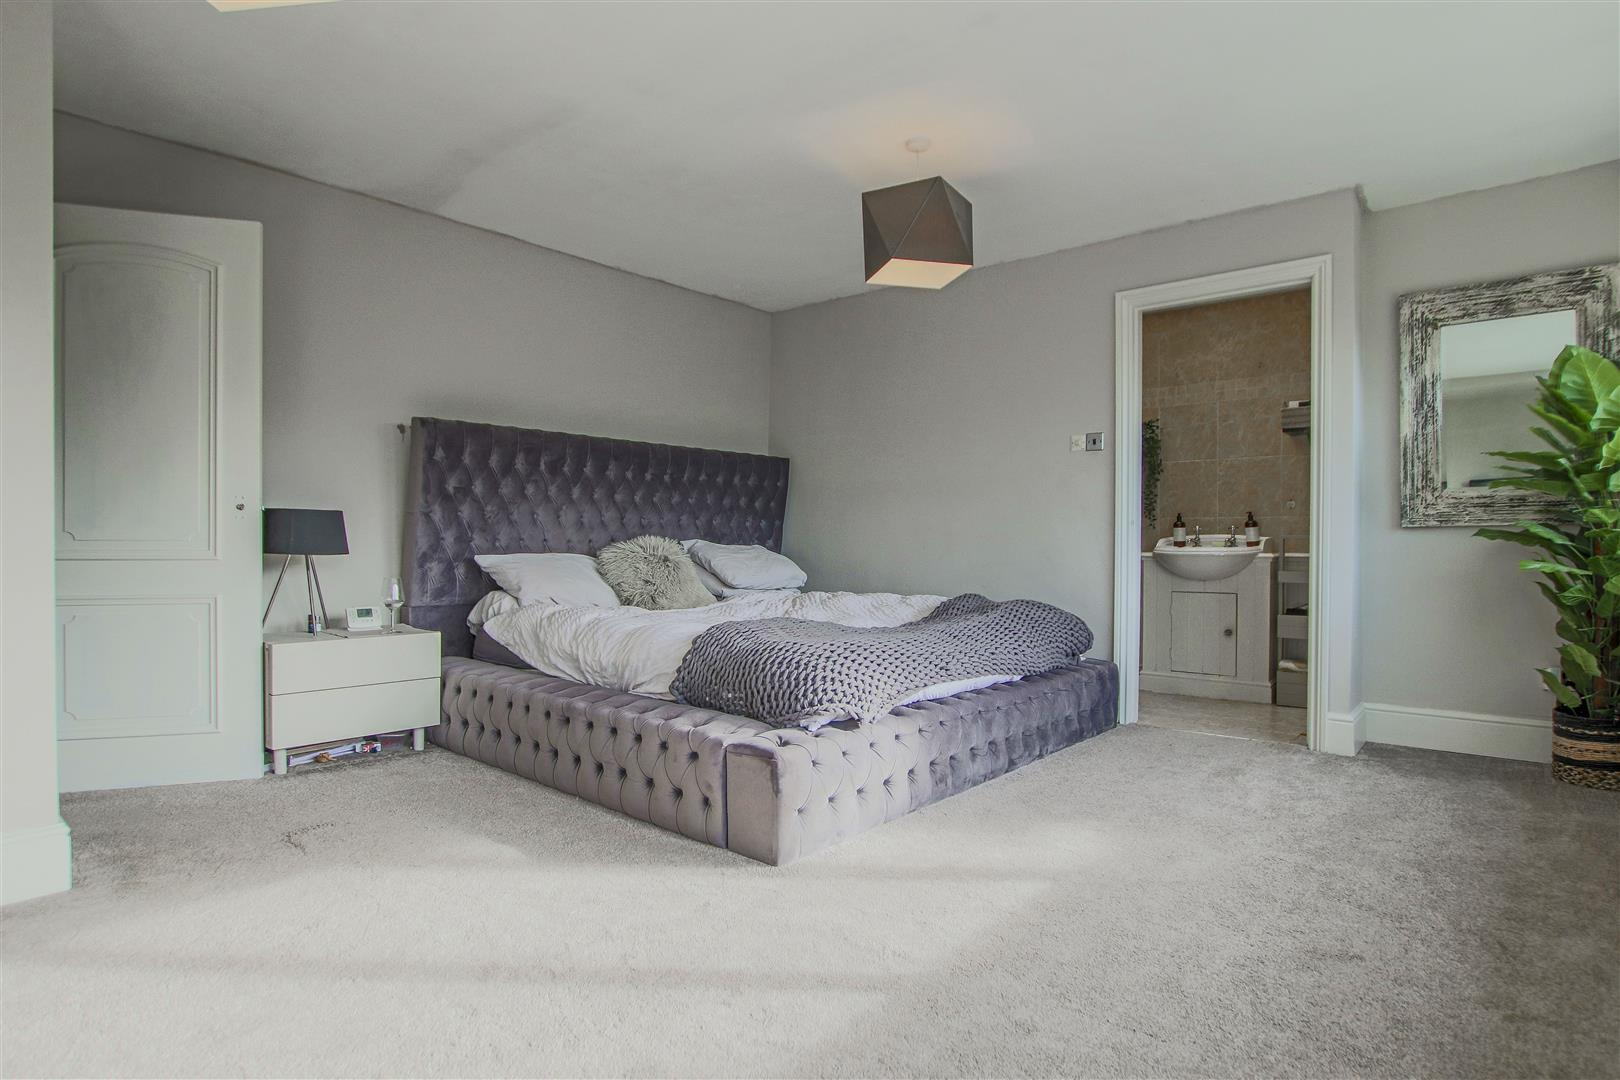 6 Bedroom Barn Conversion For Sale - 11.JPG